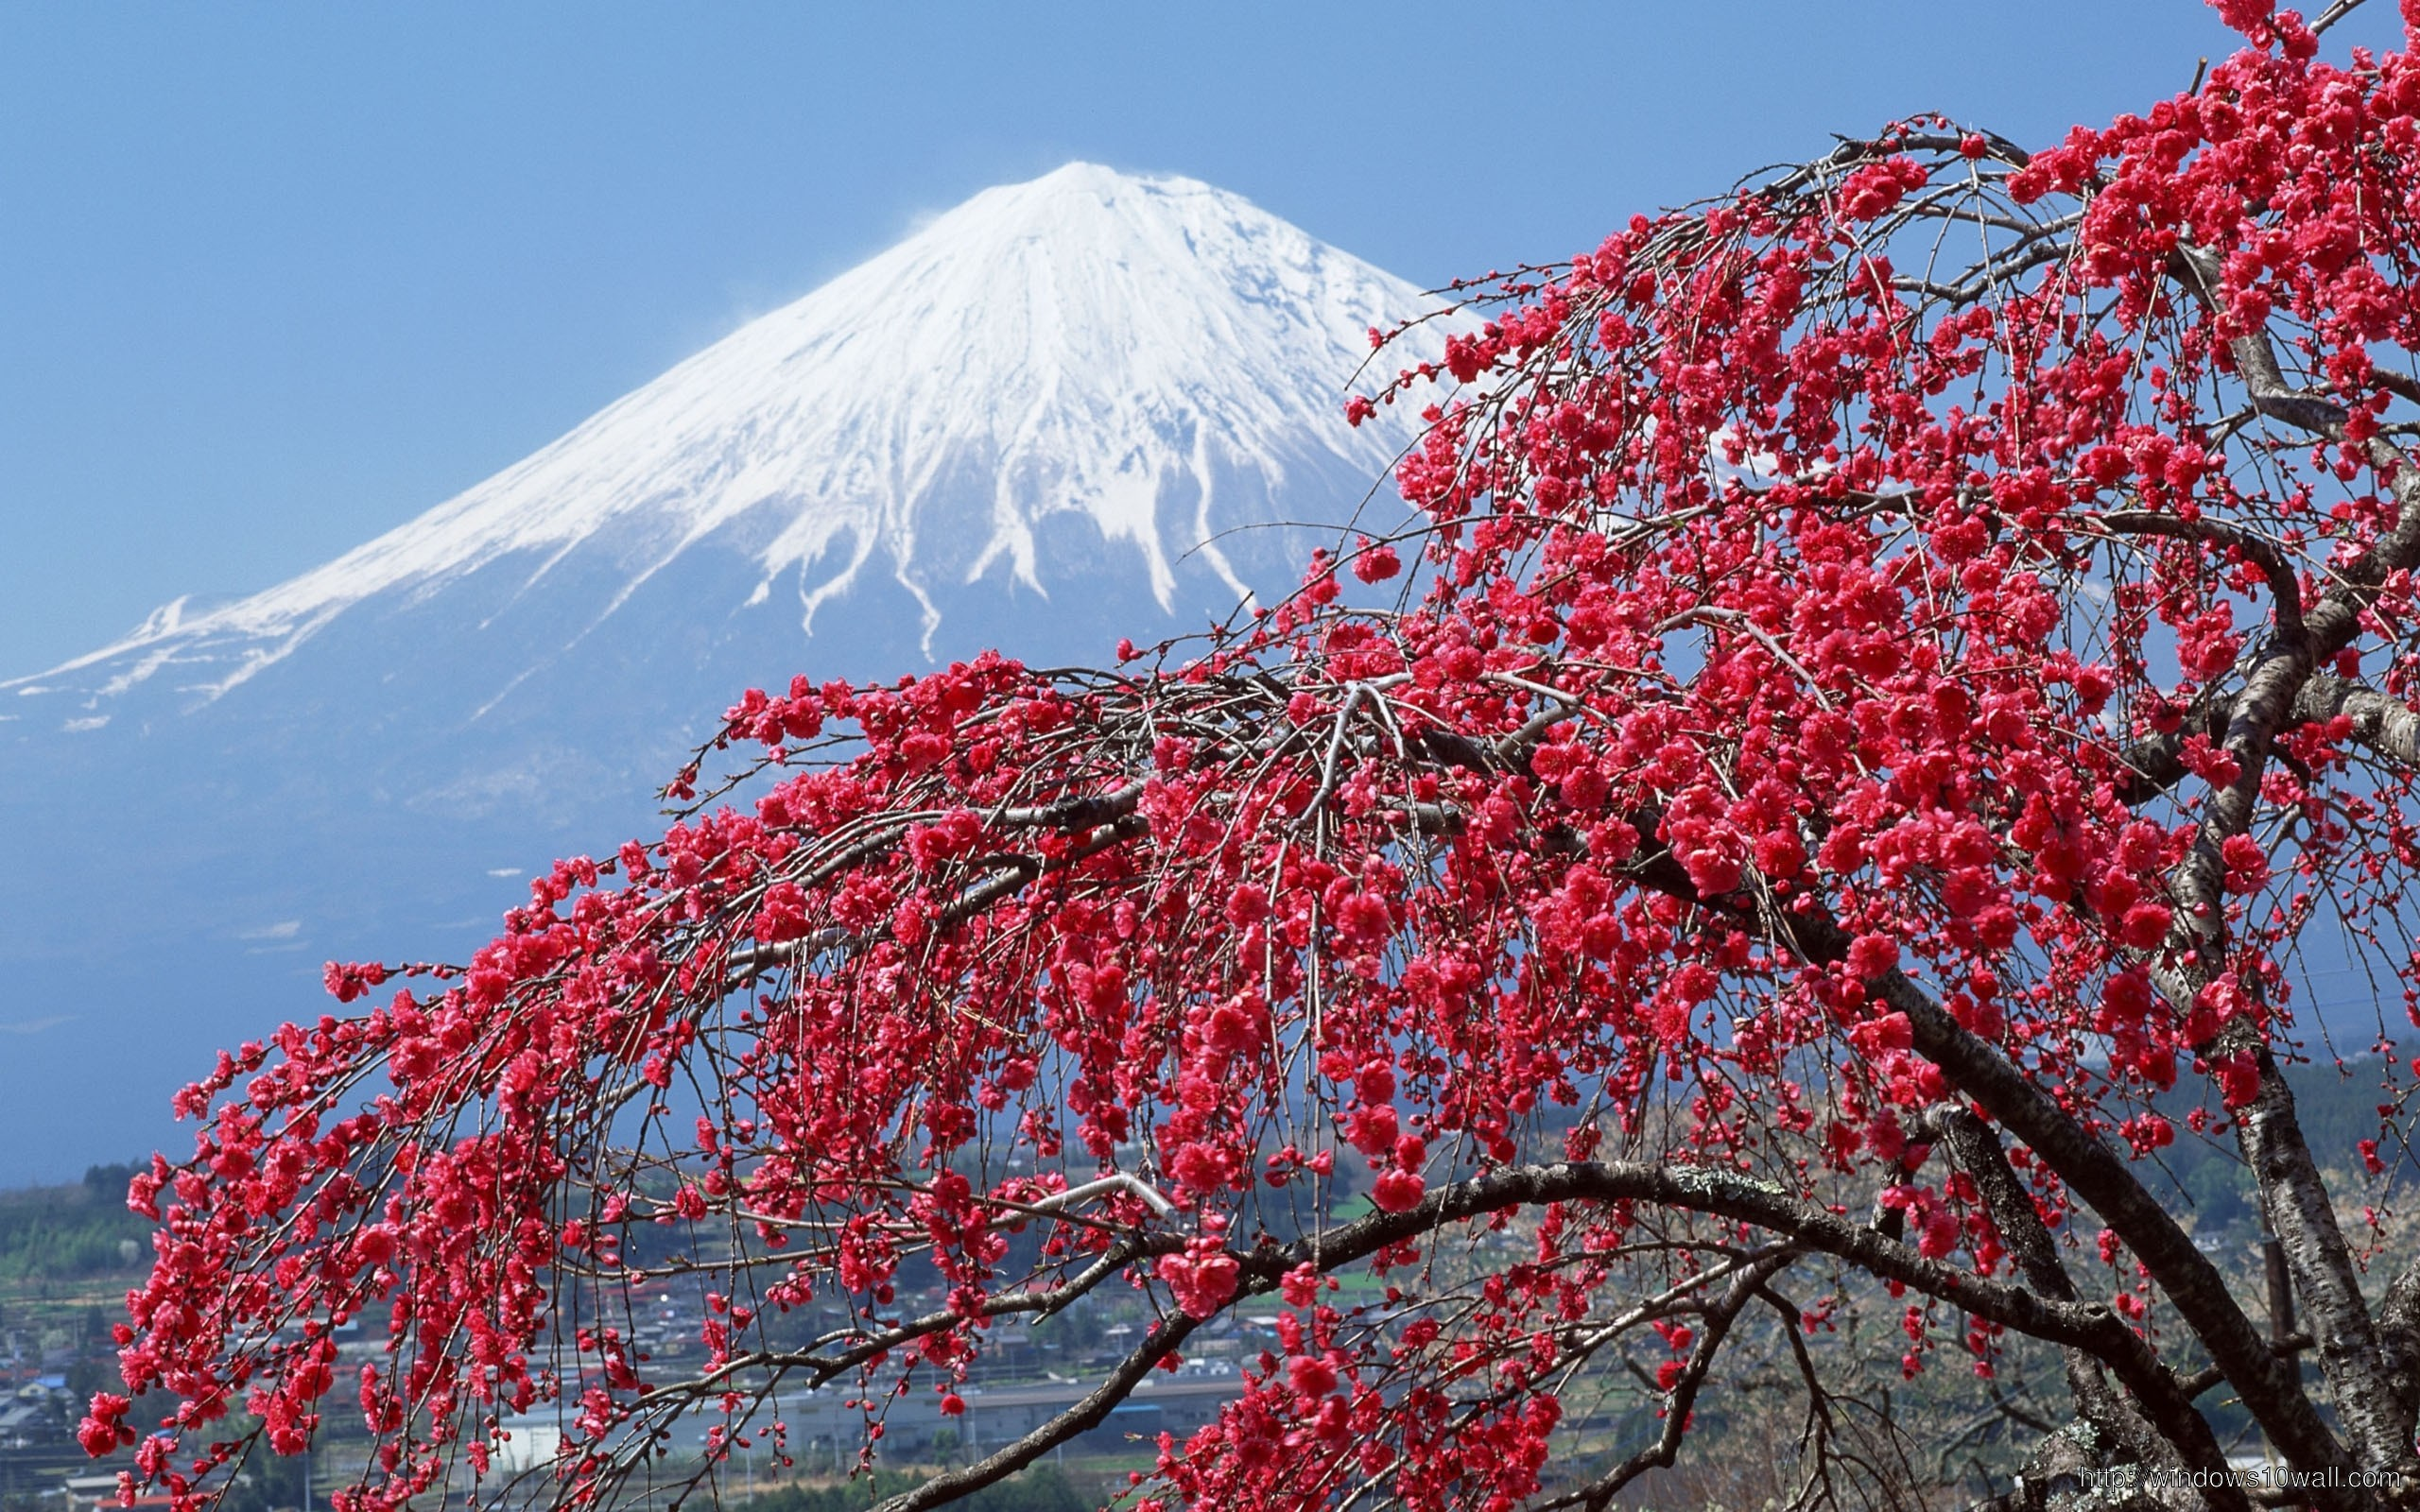 Fuji Mountain With Eyes On Top Wallpaper Windows 10